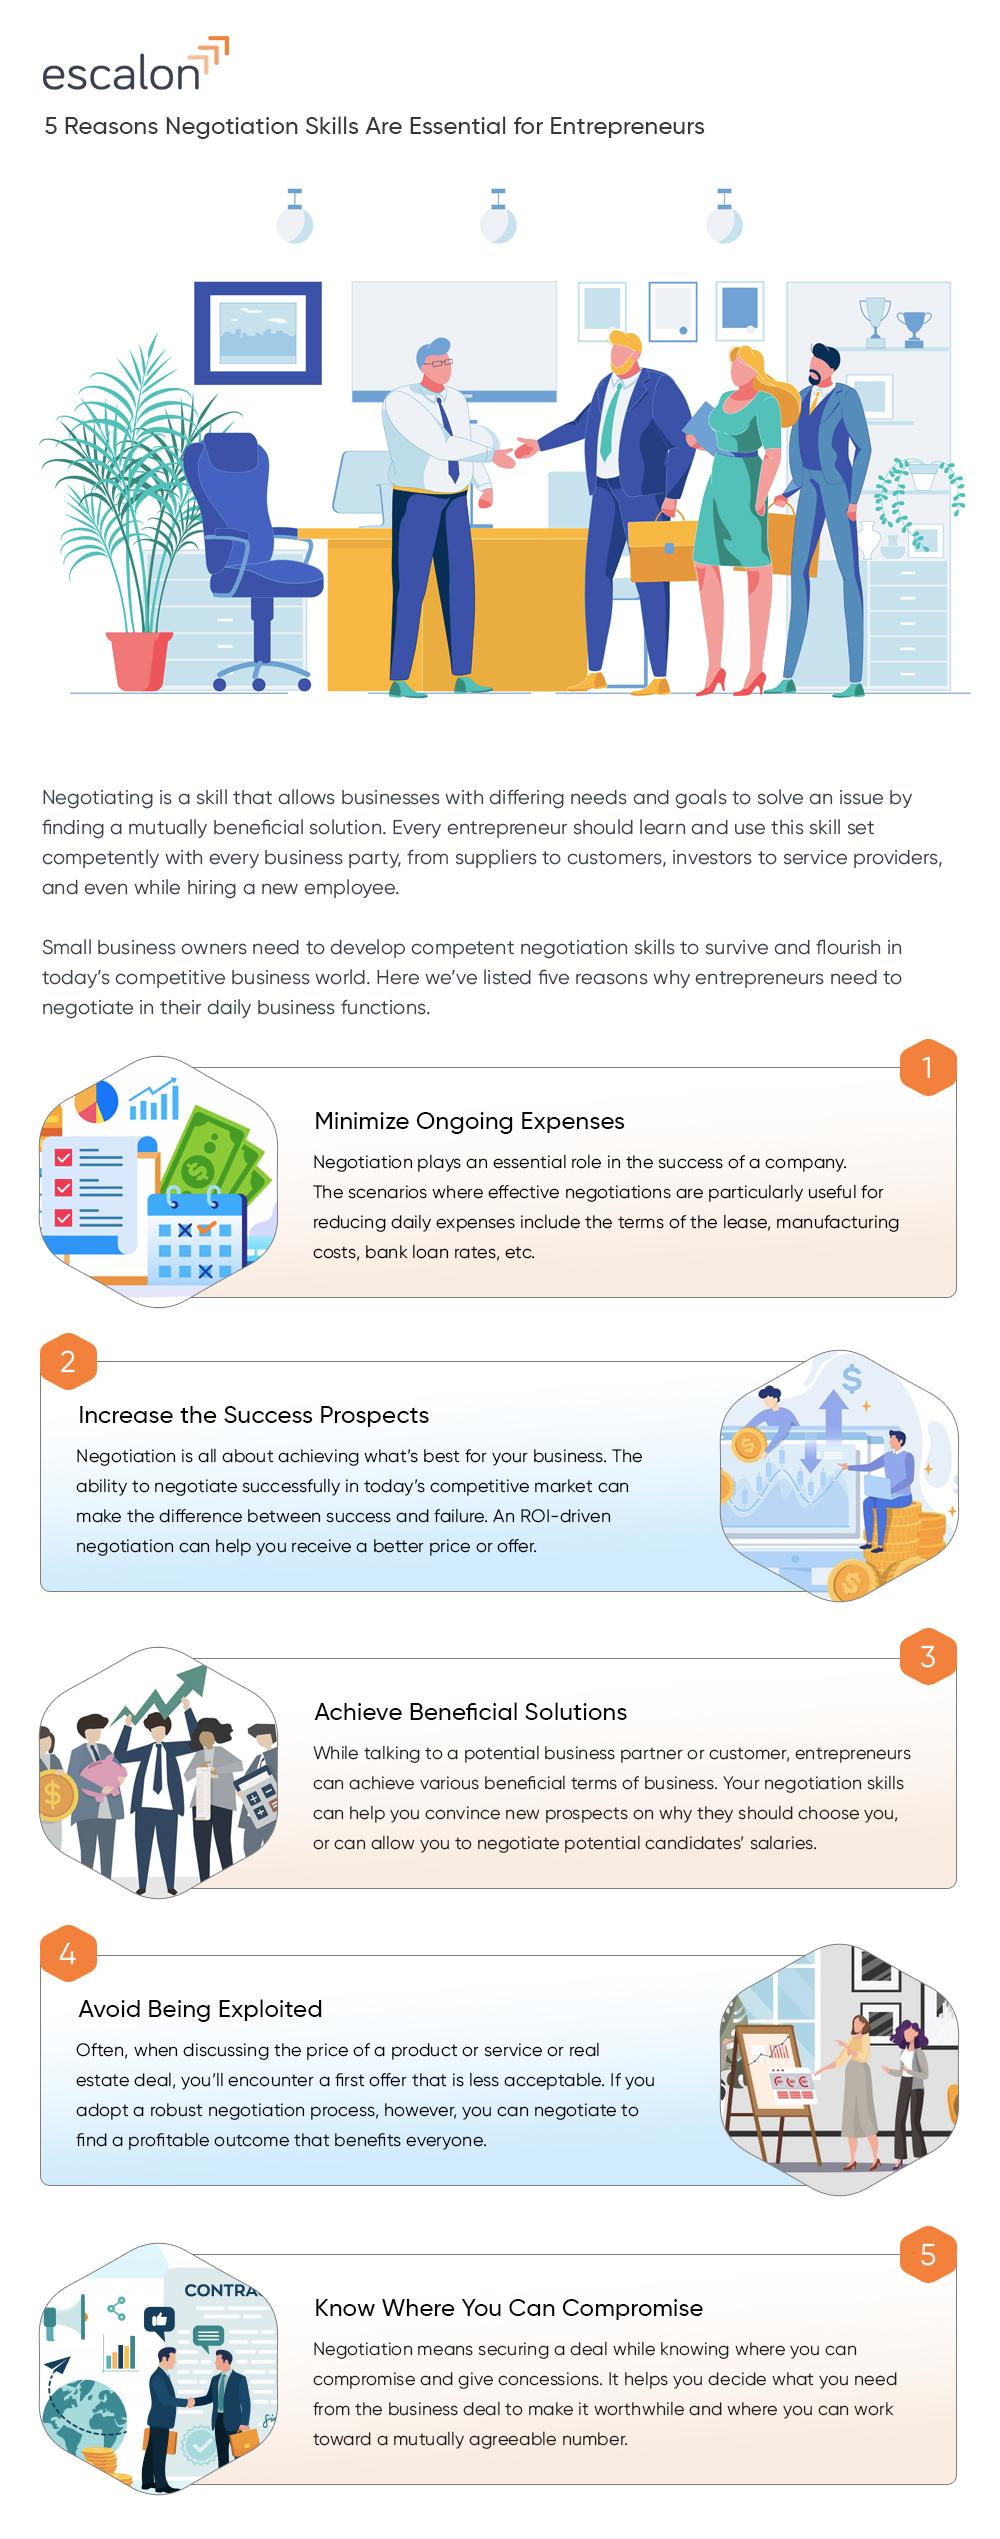 Essential negotiation skills for entrepreneurs